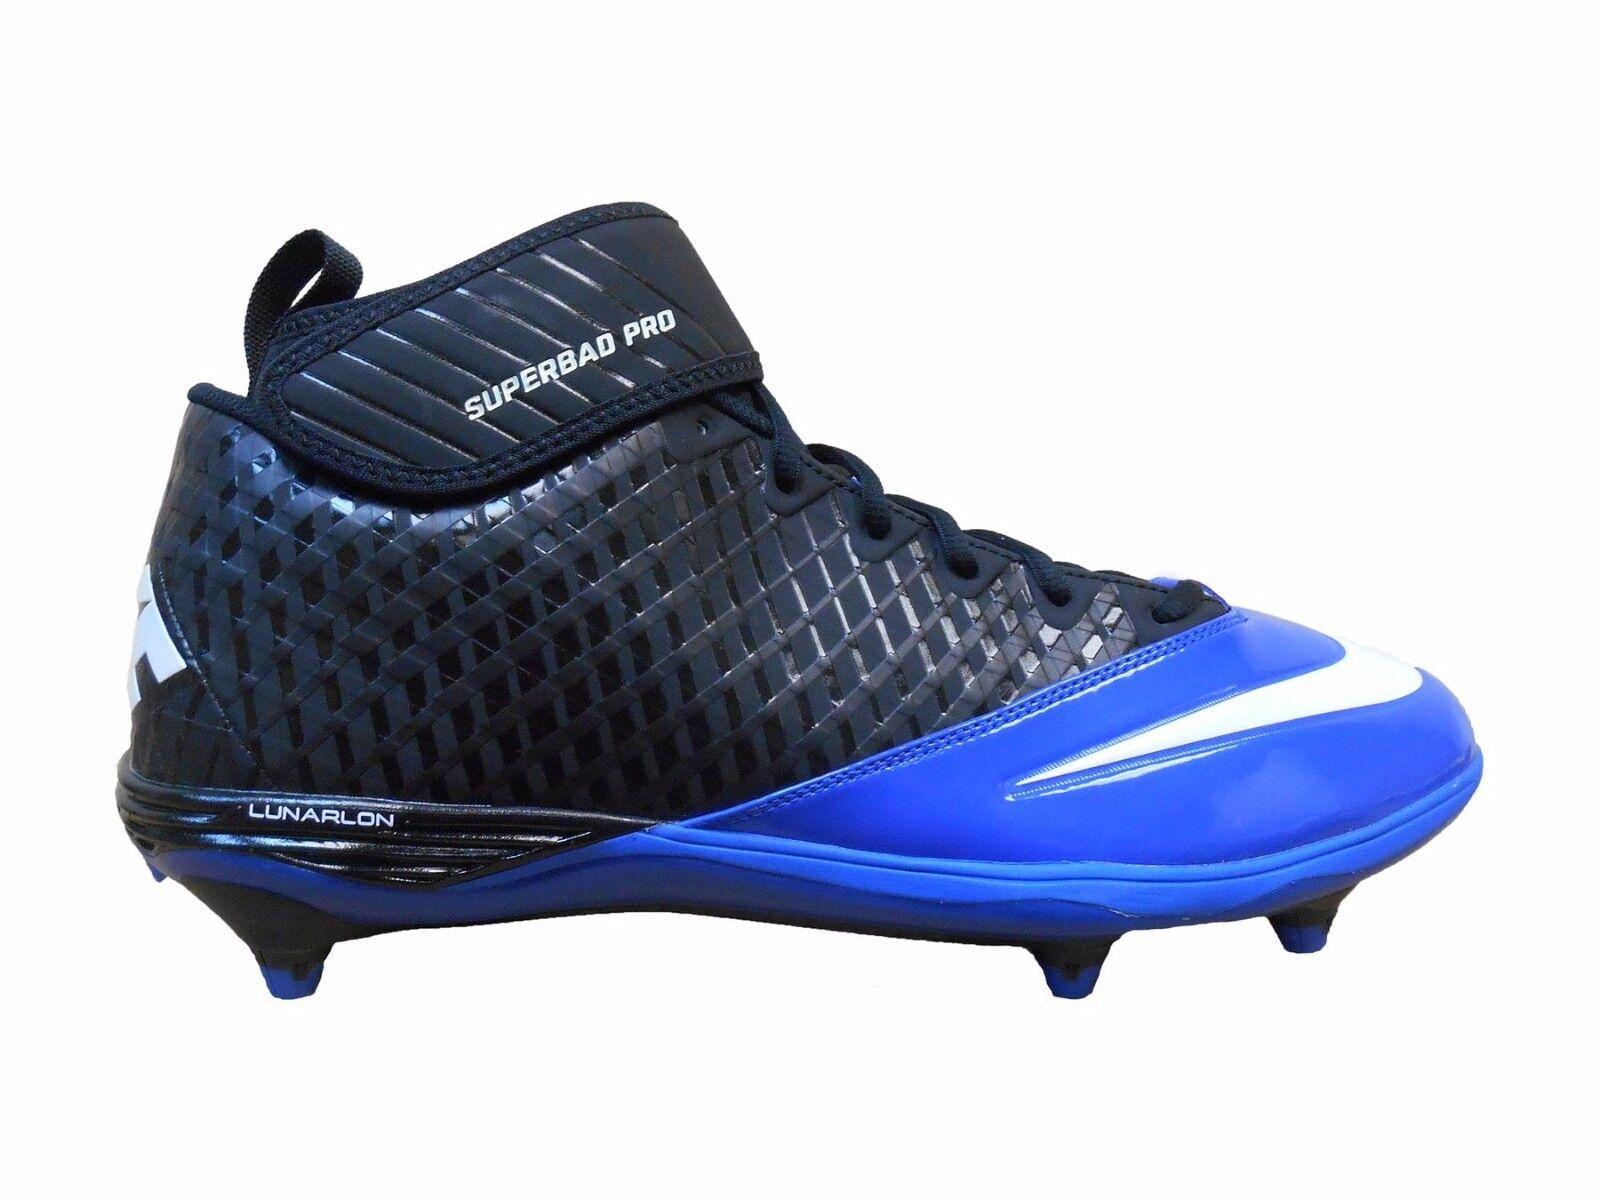 New Mens 13 NIKE Lunar Superbad Pro bluee Black Cleats shoes  105 511328-014